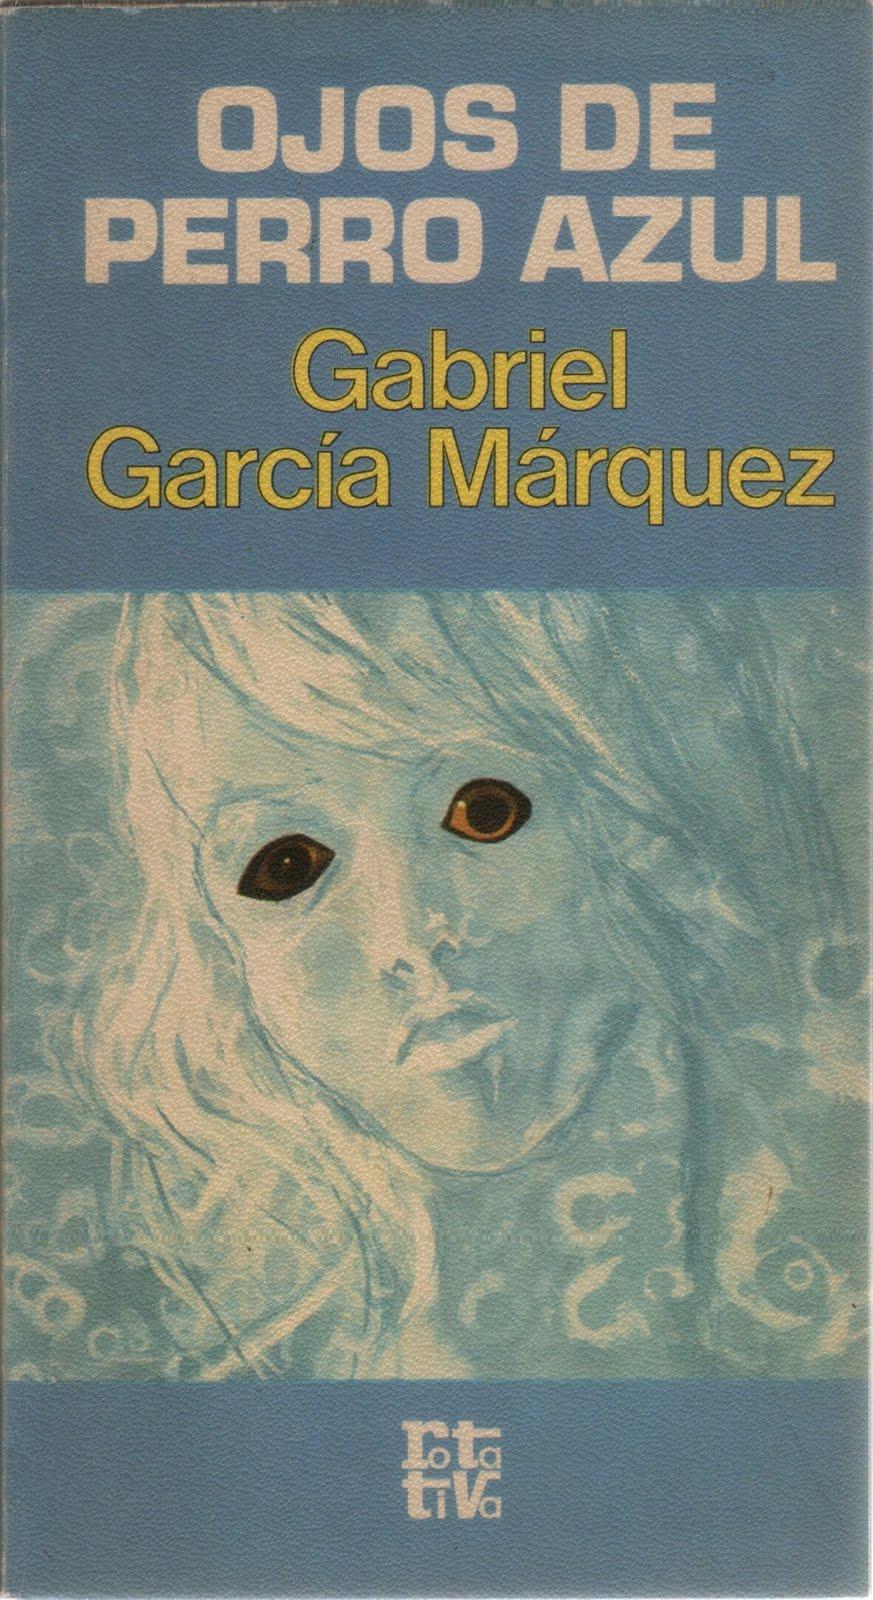 gabriel garcia marquez books pdf